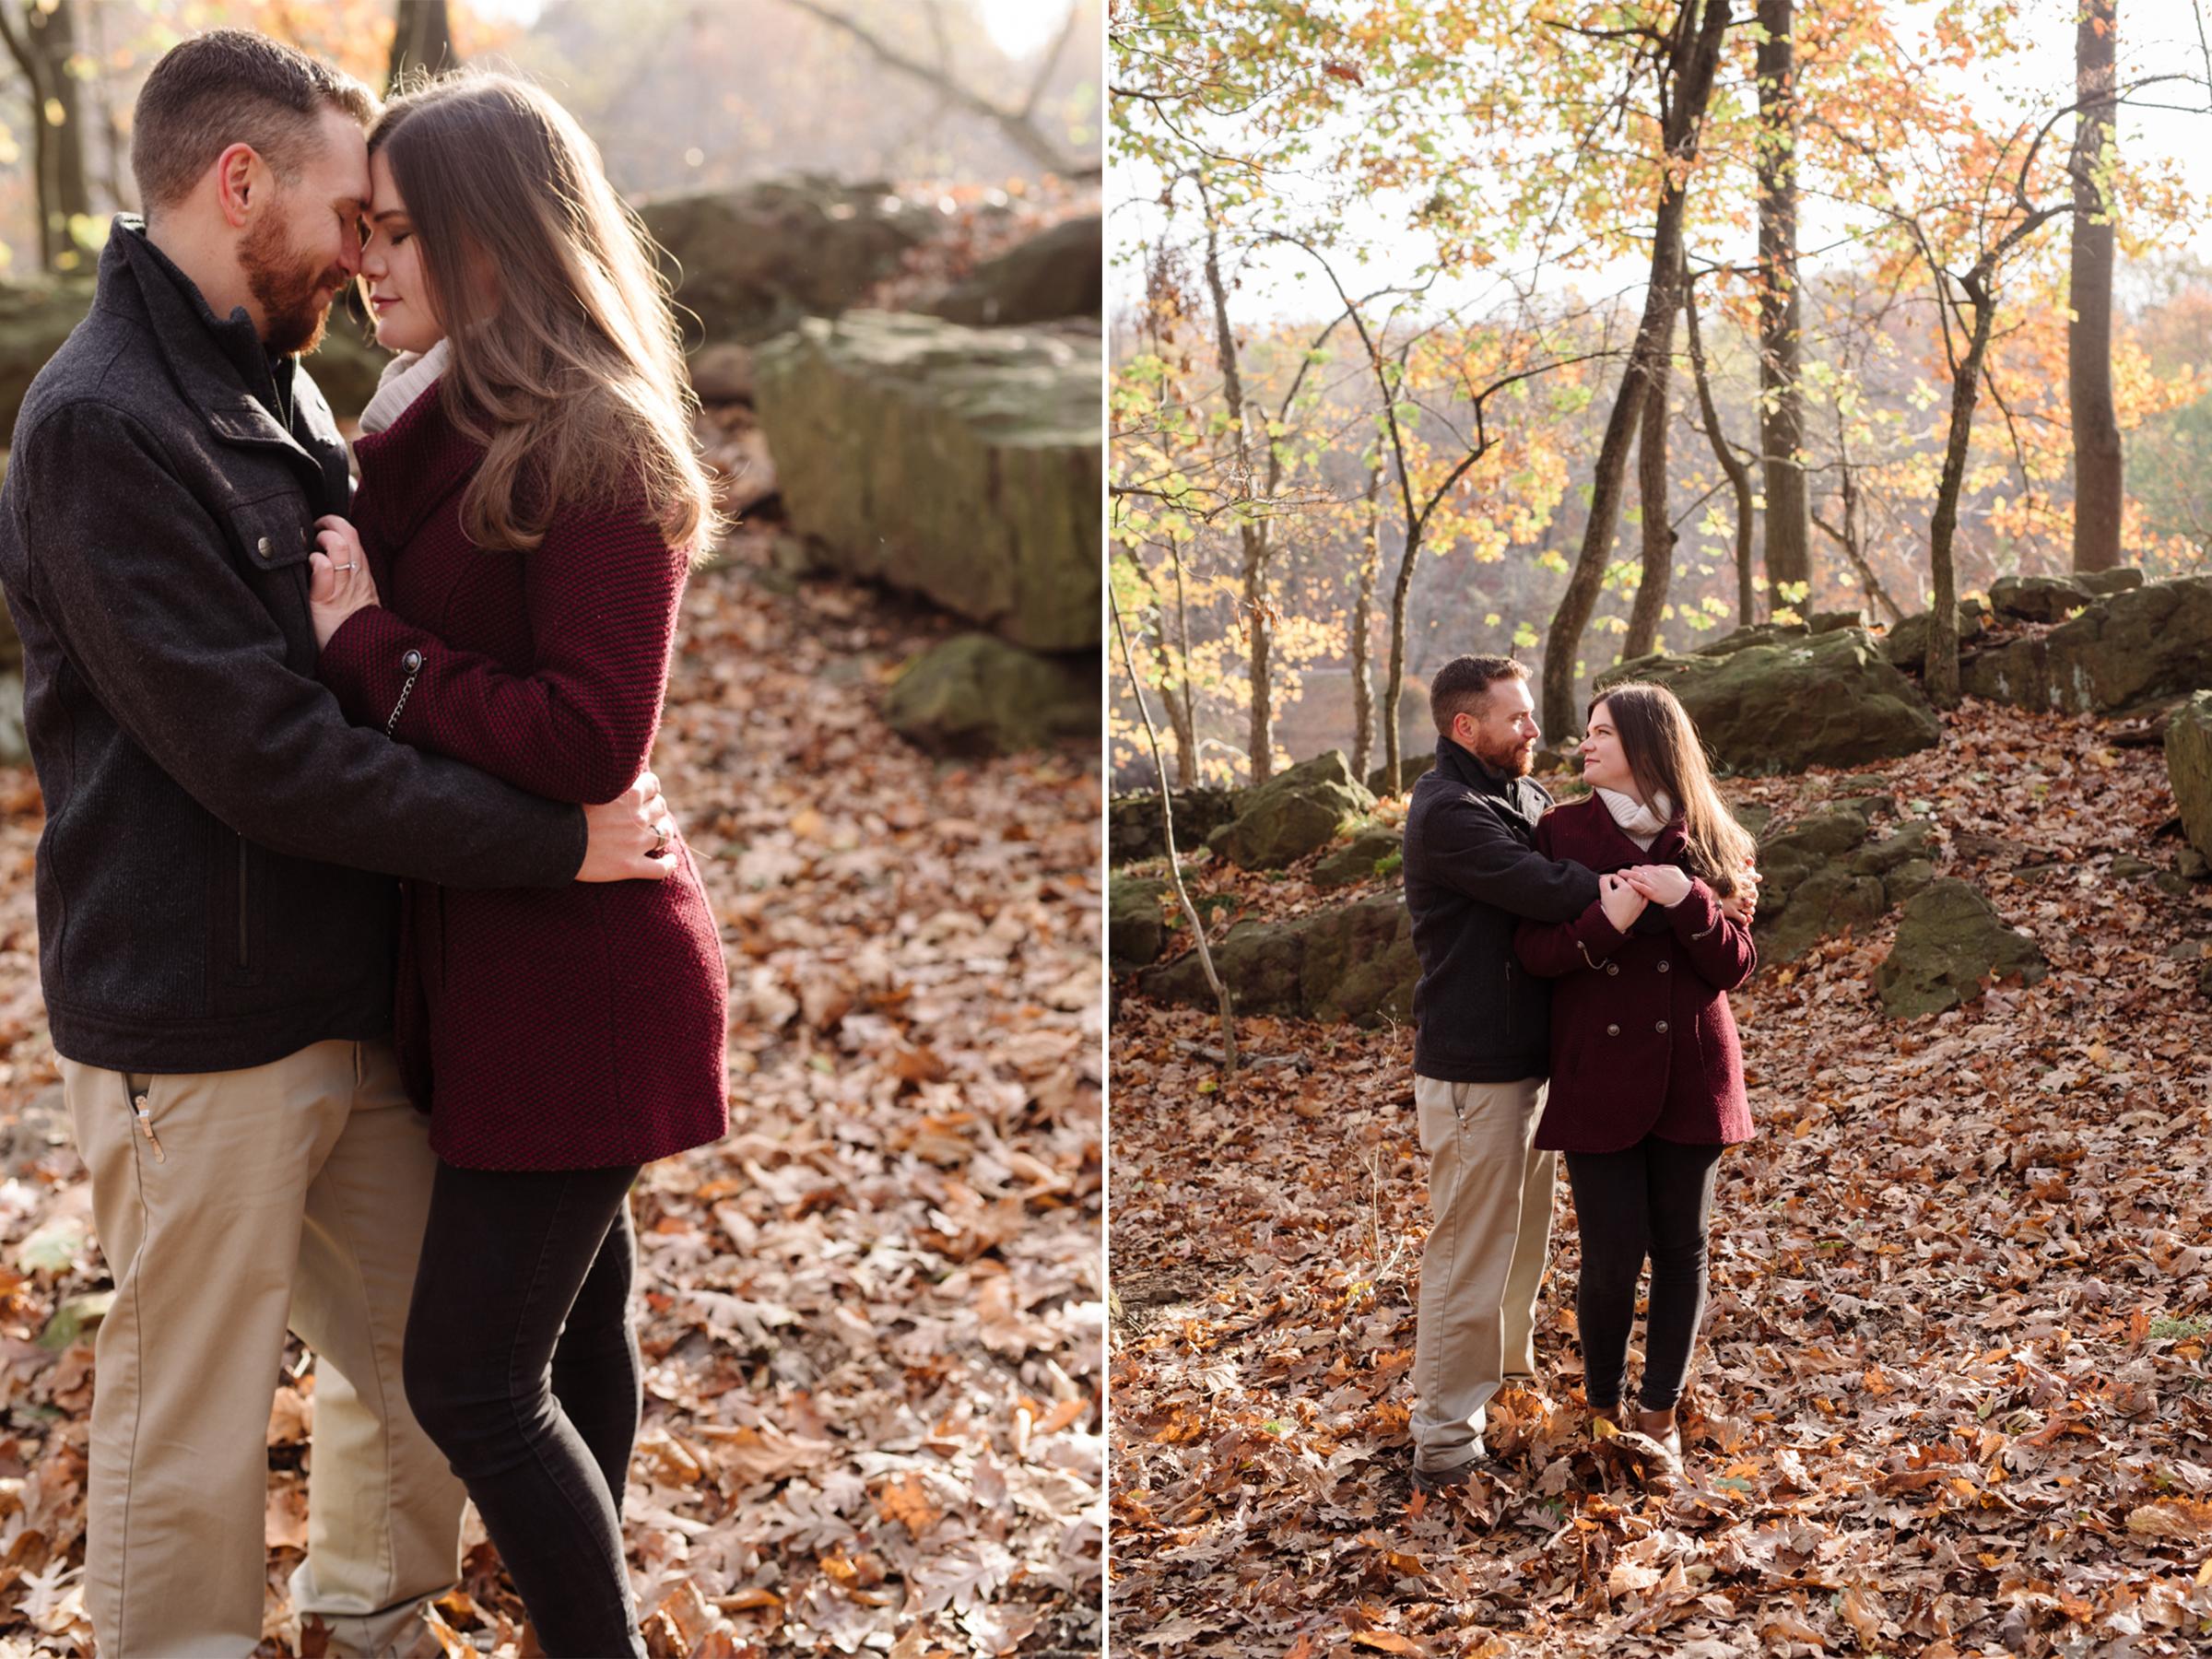 Amy+Brian- Garret Mountain Engagement Session- Fall Nature-New Jersey- Olivia Christina Photo.JPG